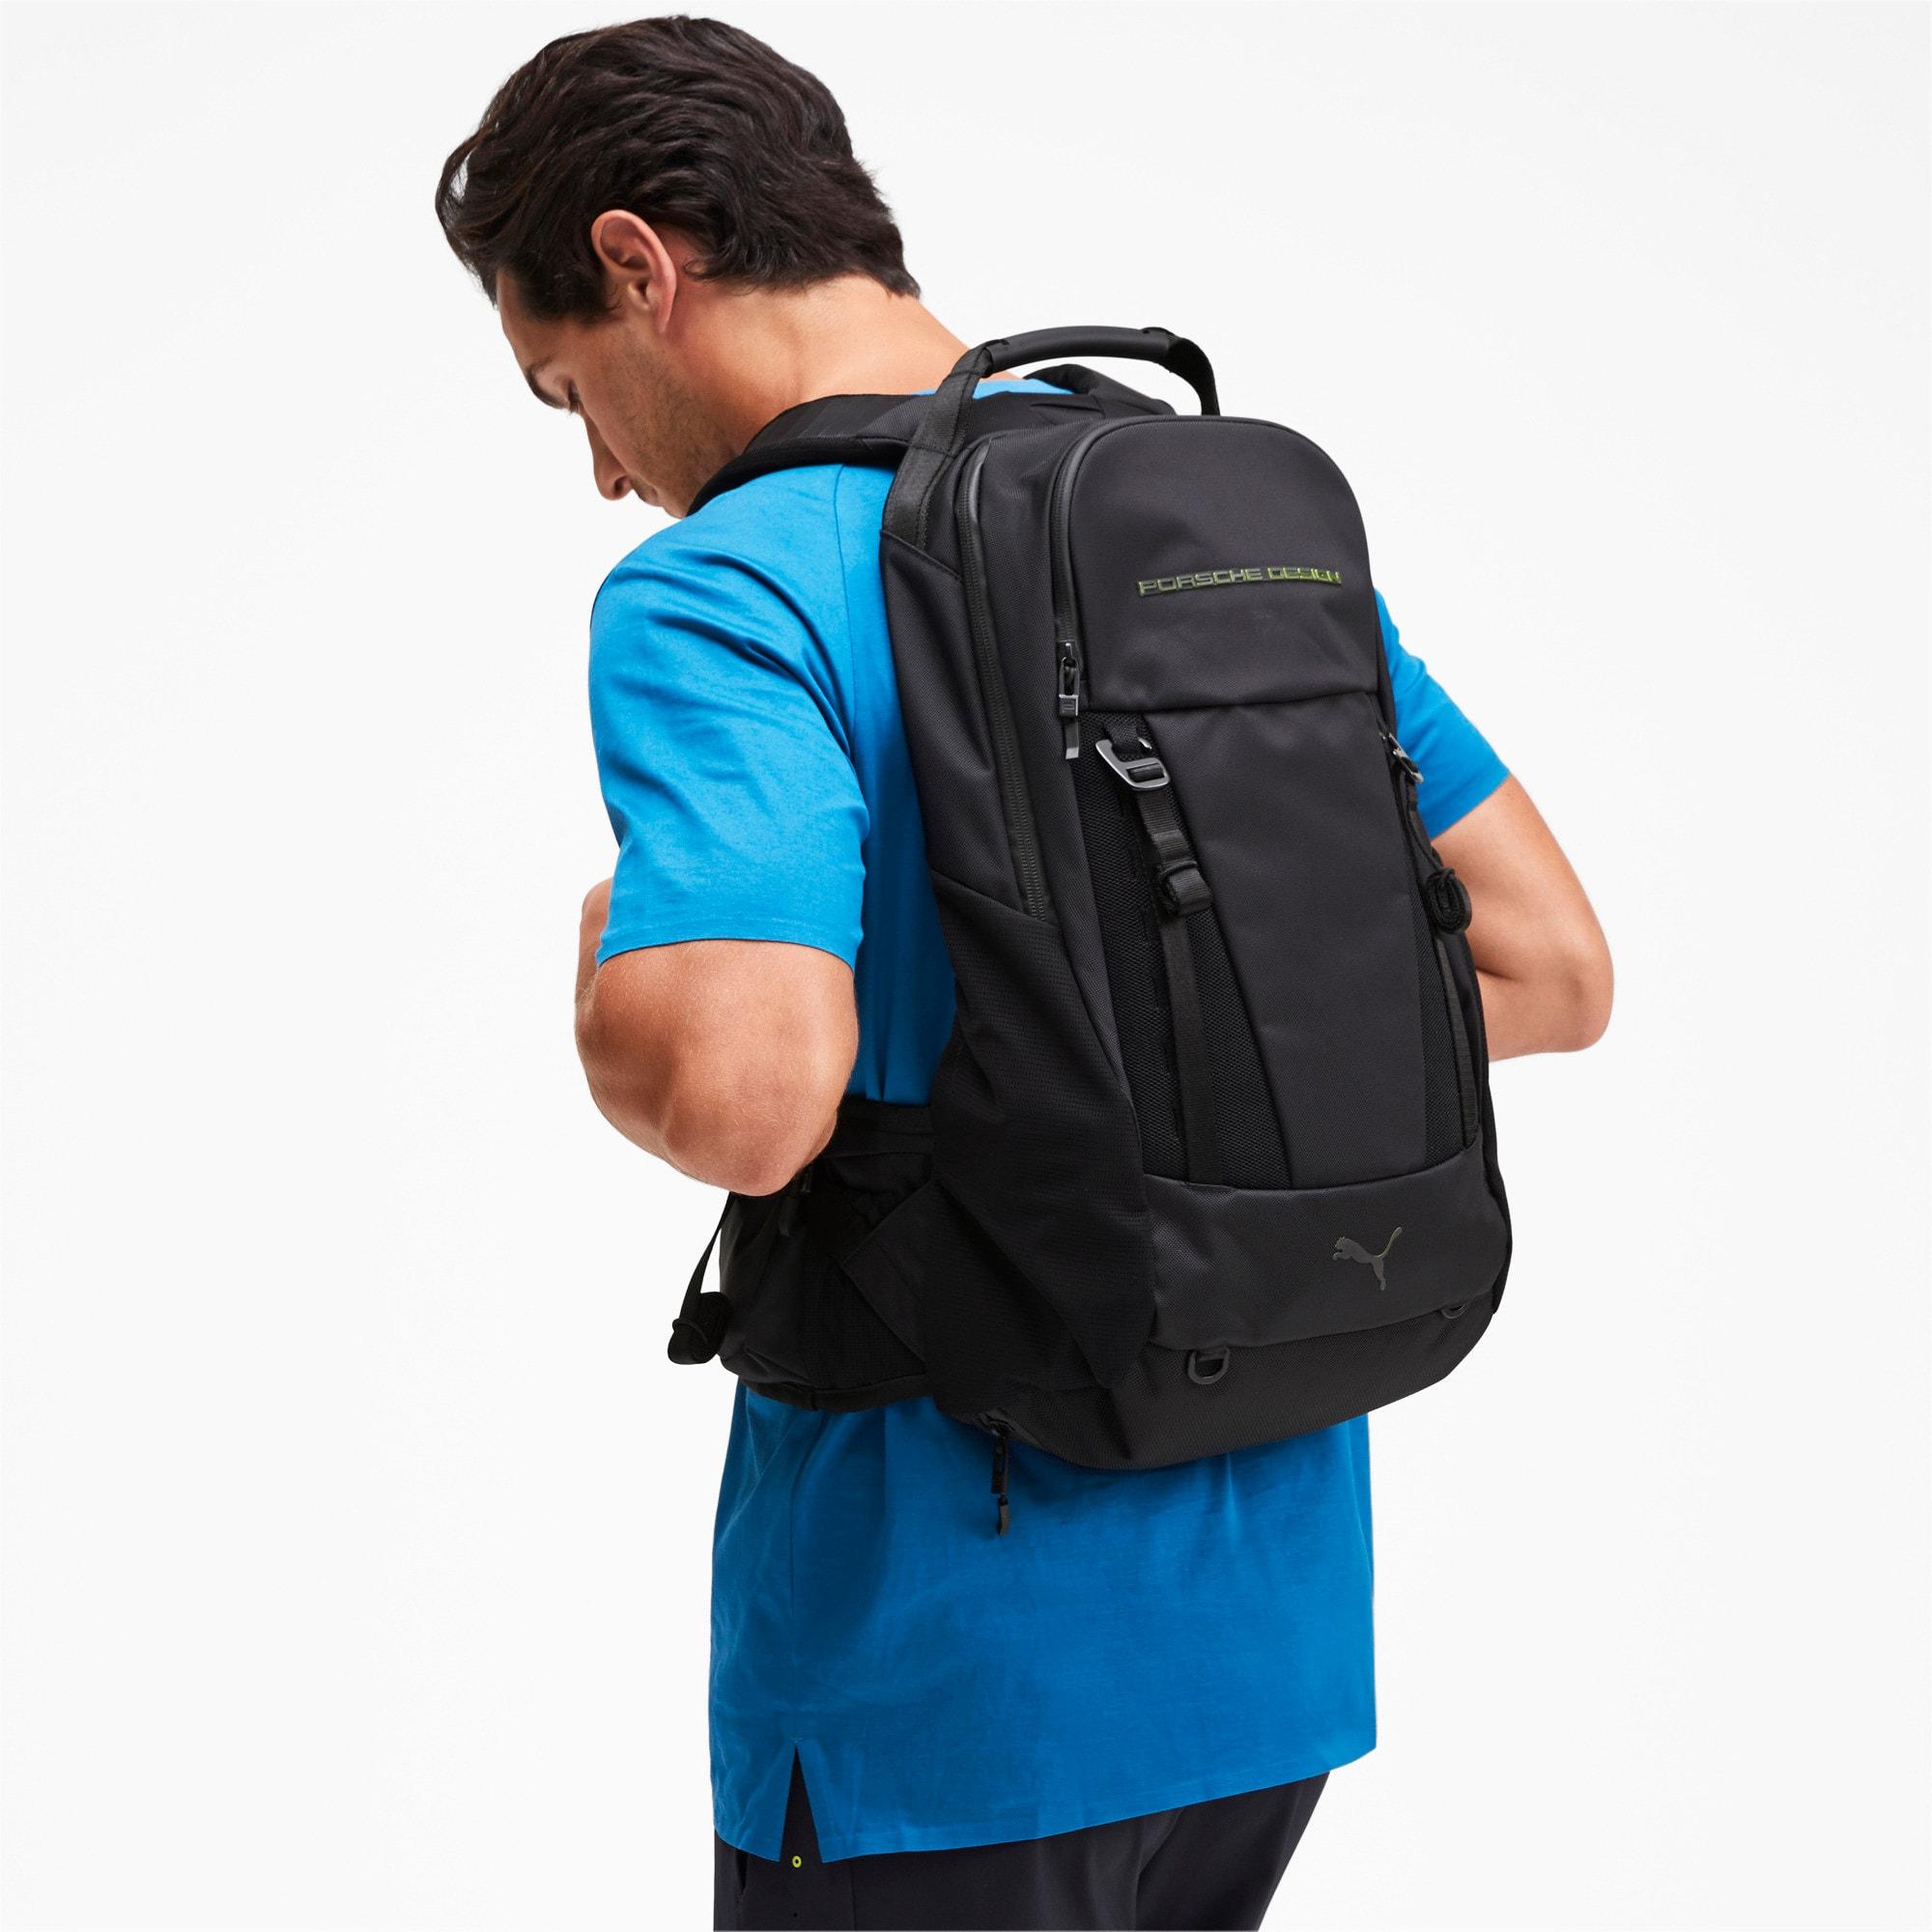 Thumbnail 2 of Porsche Design evoKNIT Active Backpack, Puma Black, medium